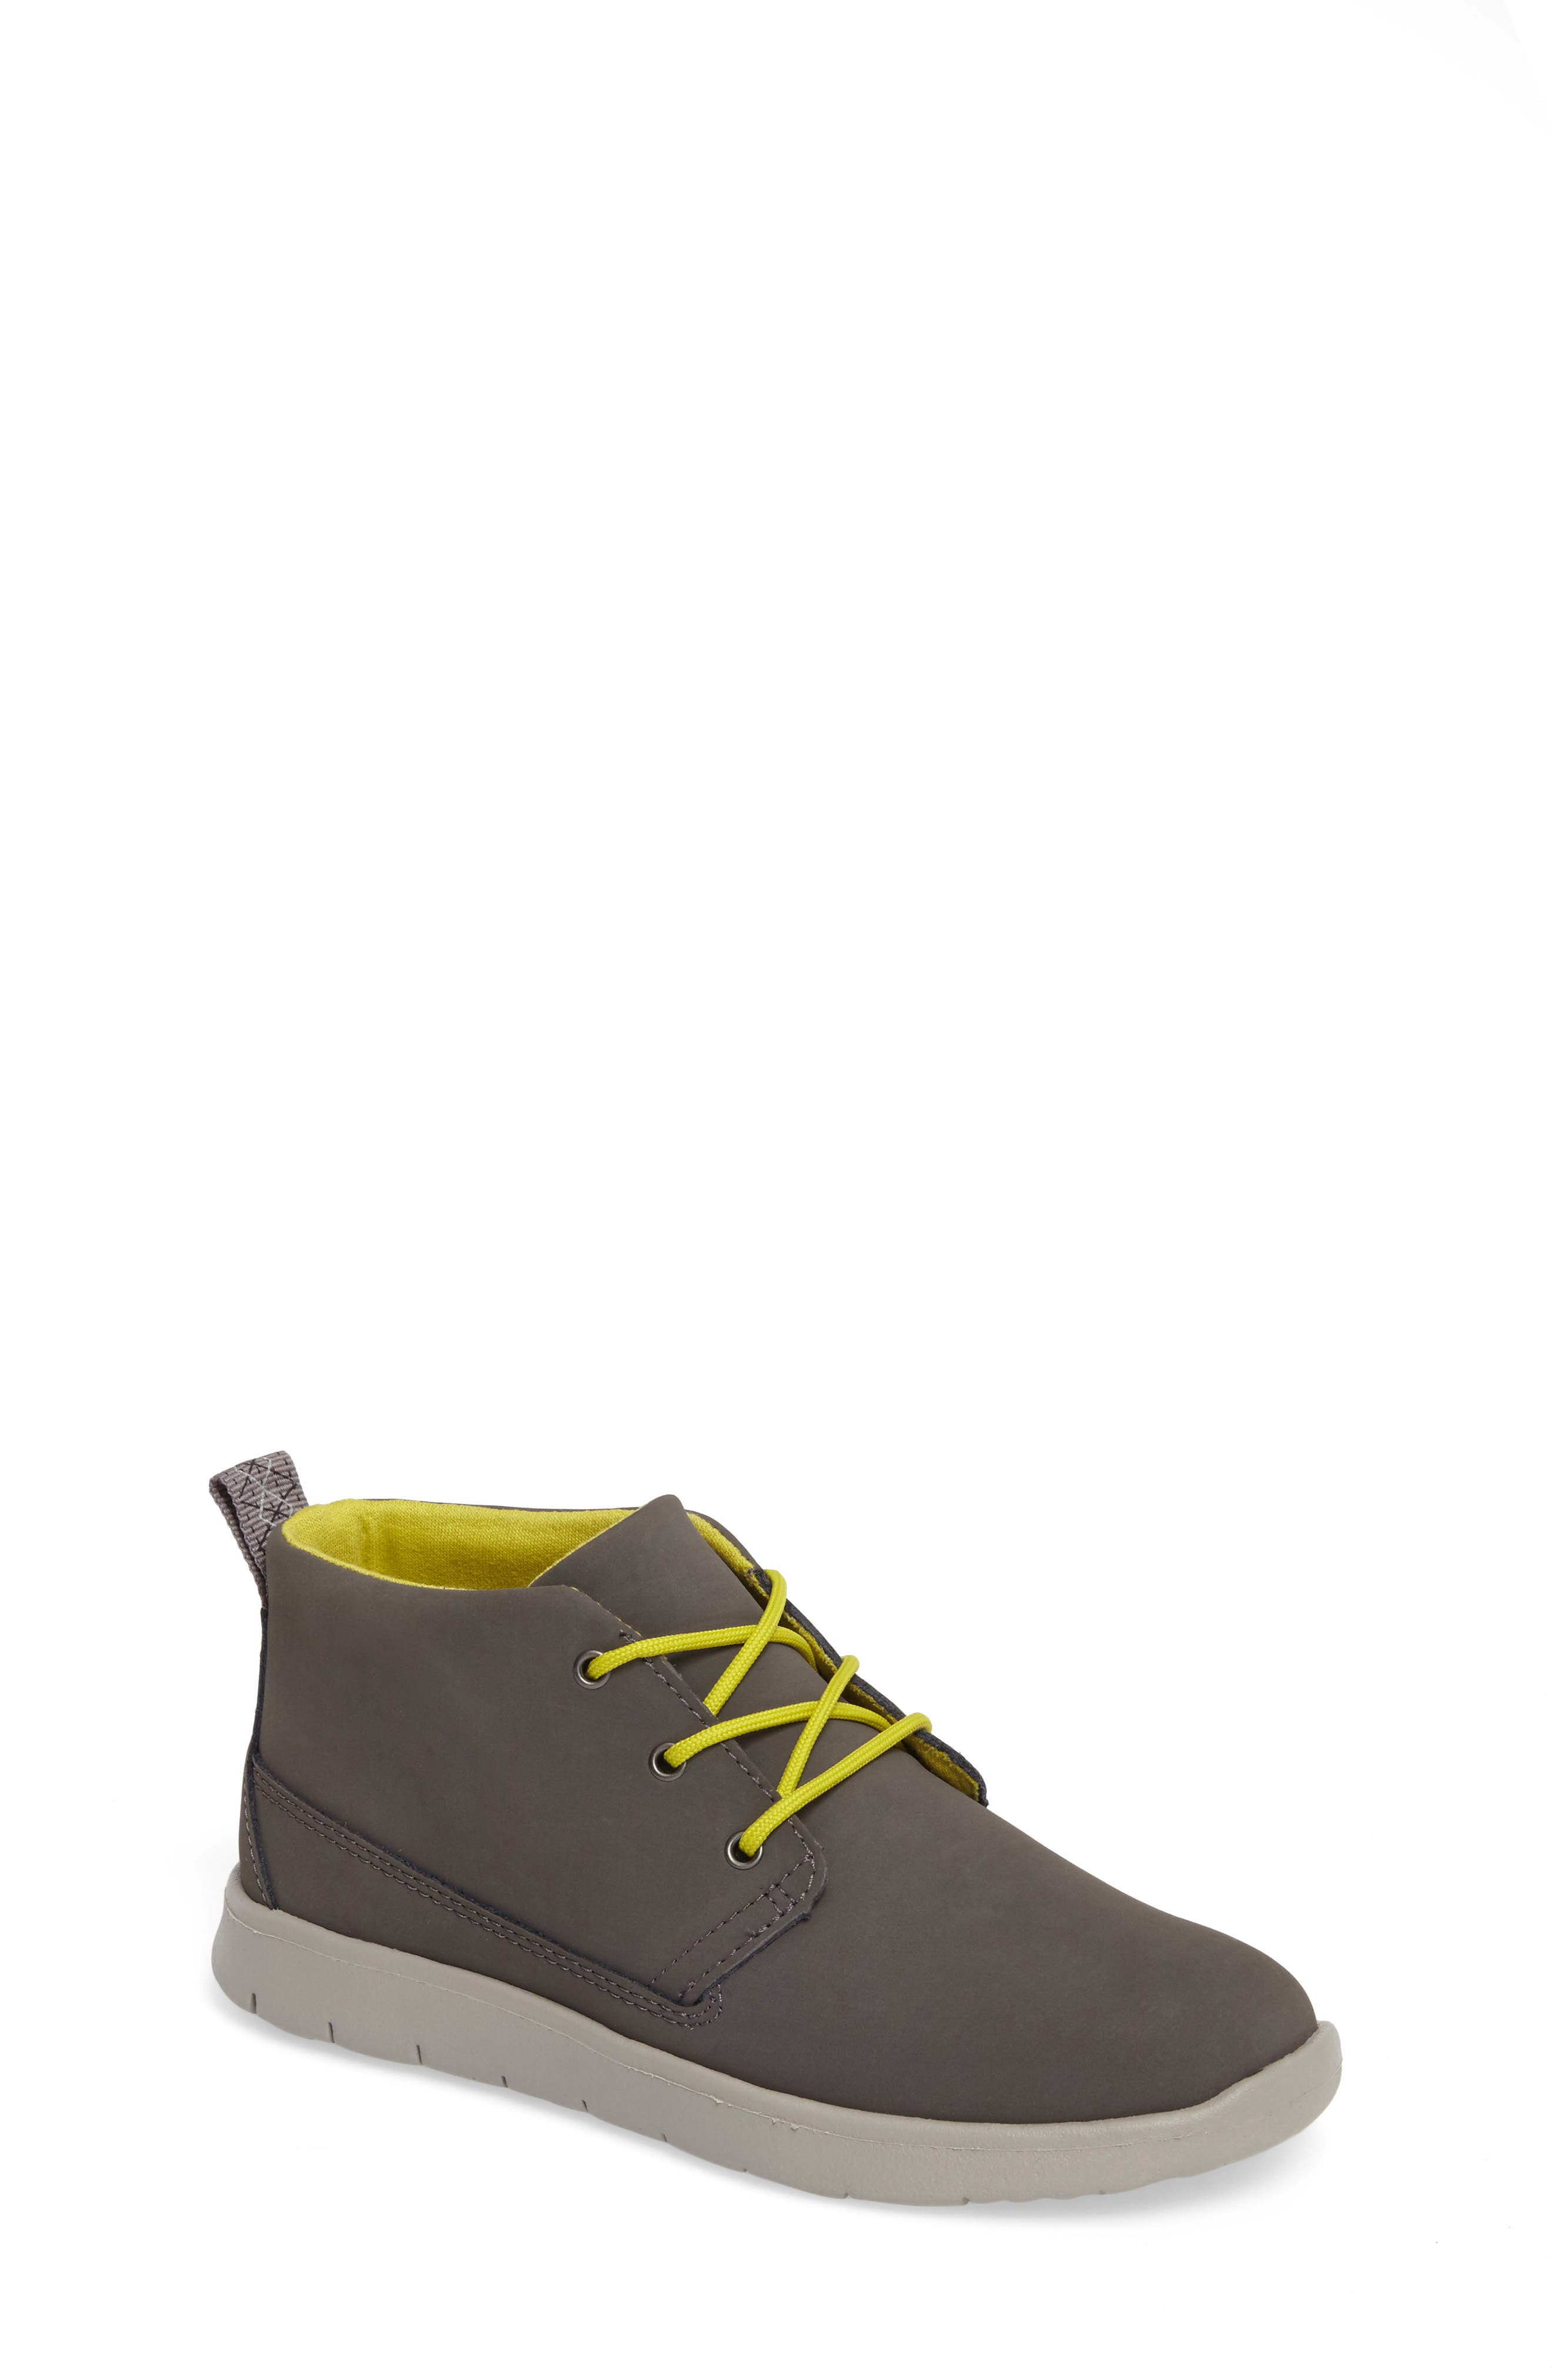 Canoe Water Resistant Chukka Sneaker,                             Main thumbnail 2, color,